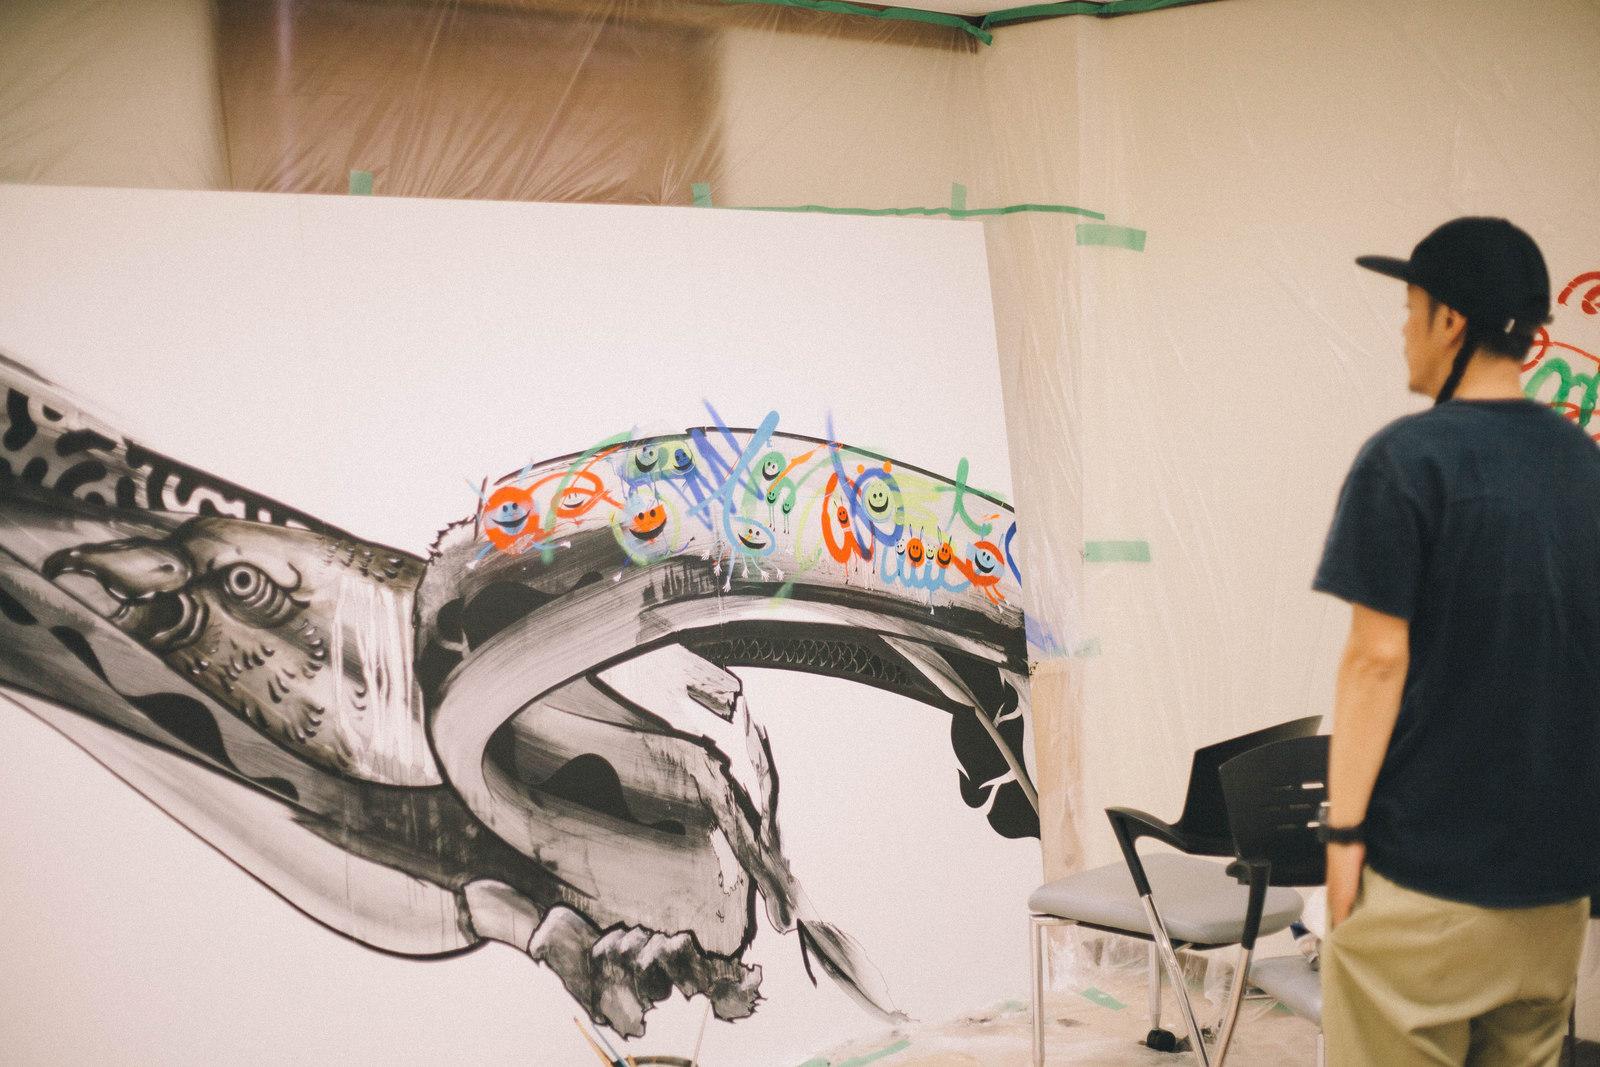 IMG_1343 国内外で活躍するアーティスト4組の「作品の向こう側」| ジャーナル スタンダード「オムニバス展」密着レポート!